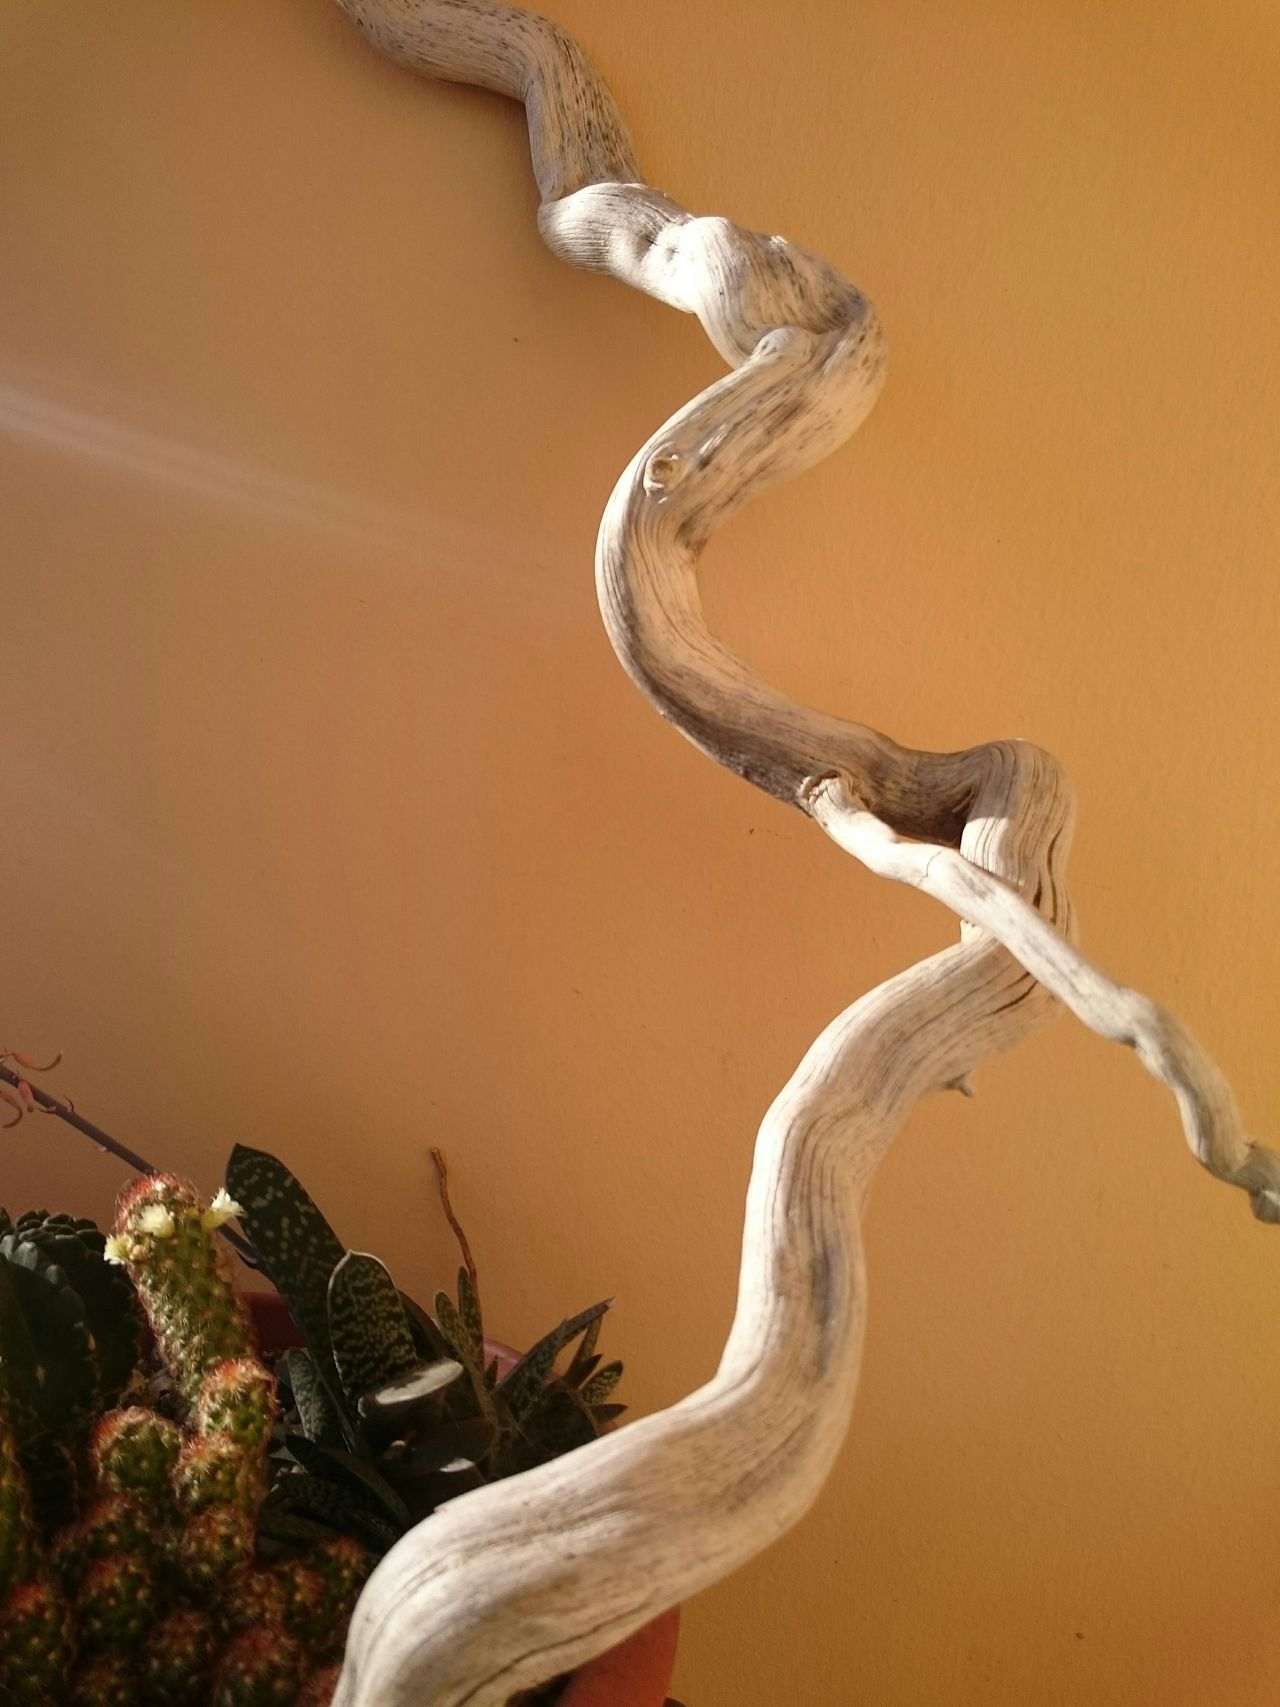 Wood Wood Art Natural Born Beauty